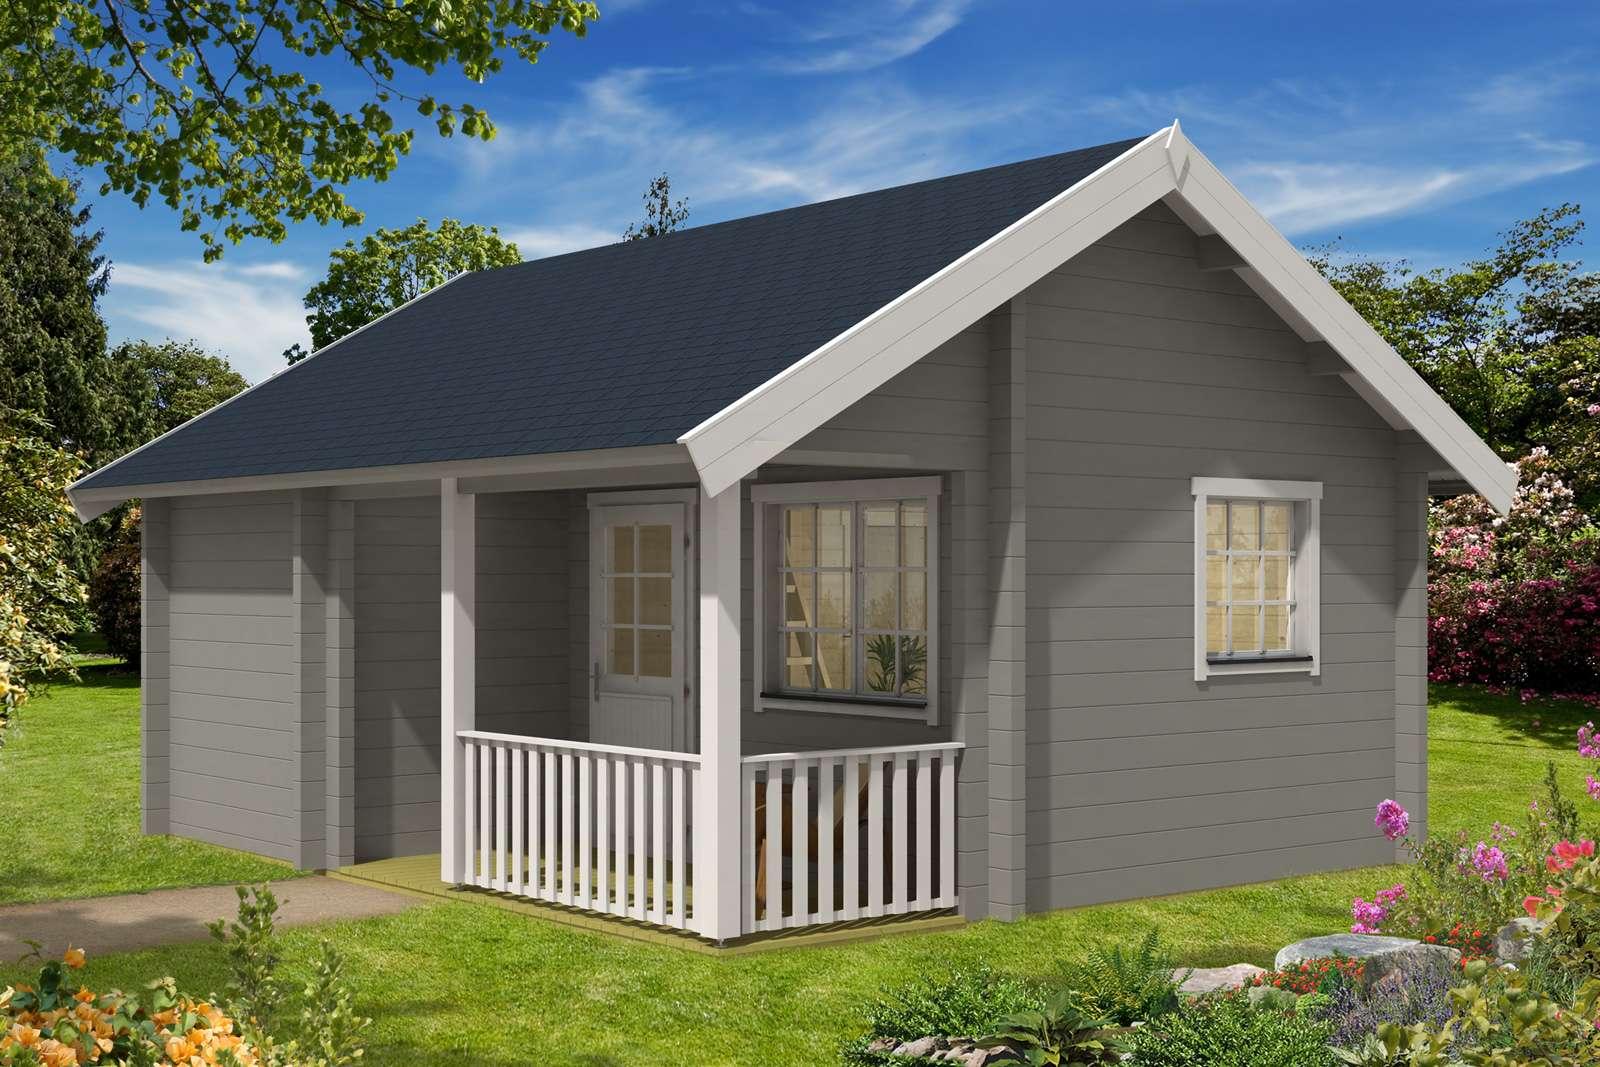 gartenhaus baugenehmigung bonn my blog. Black Bedroom Furniture Sets. Home Design Ideas